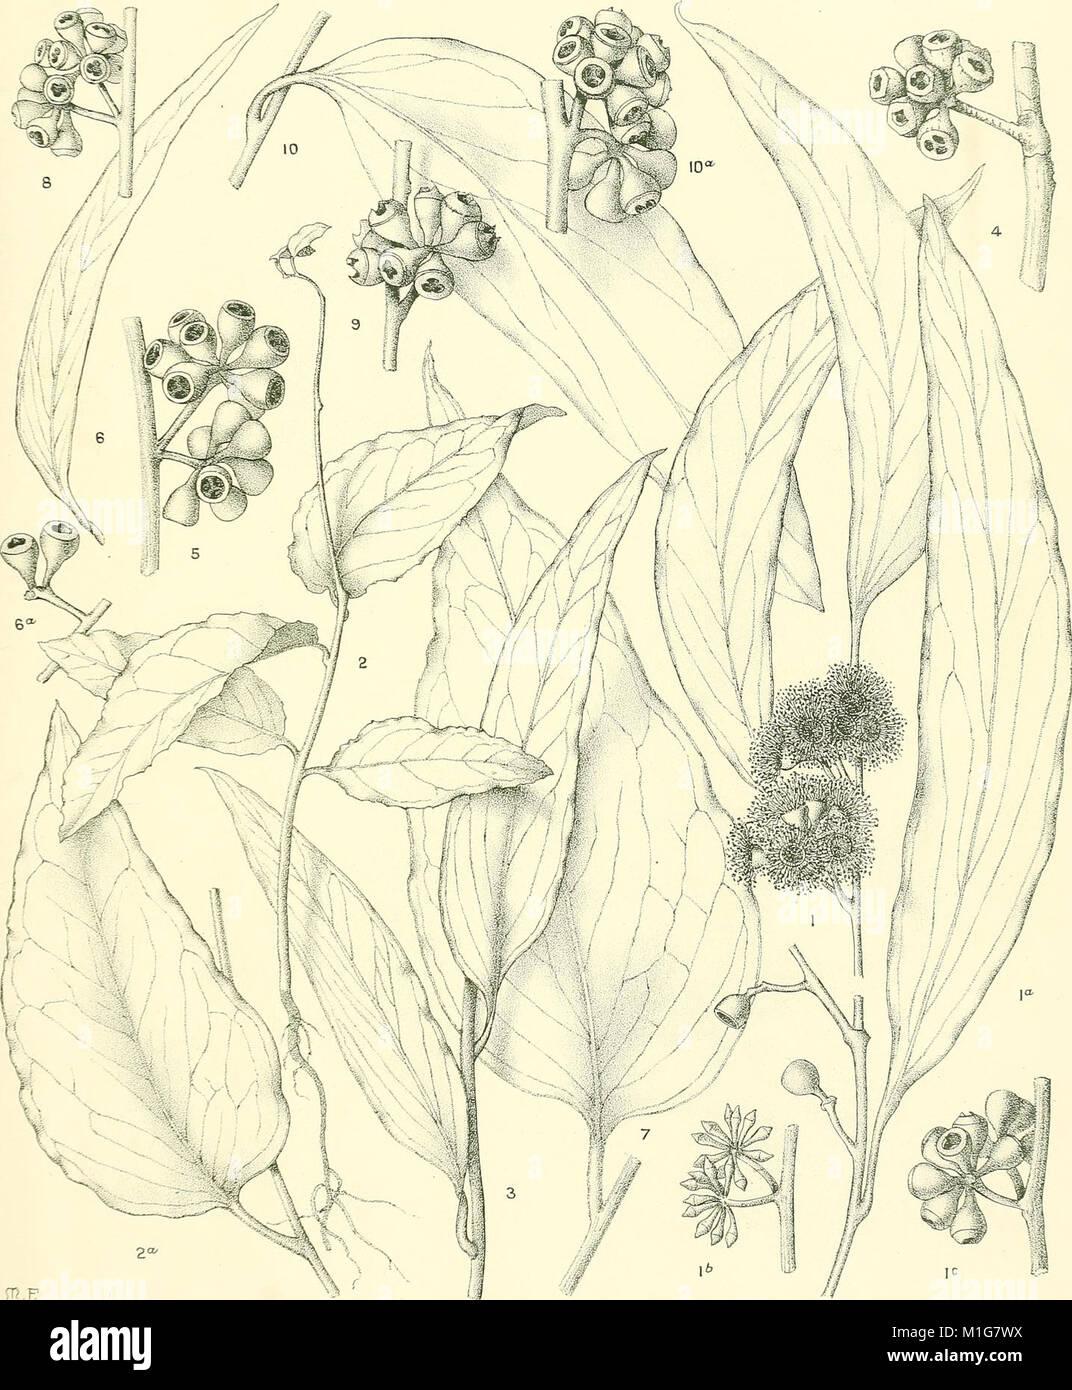 A critical revision of the genus Eucalyptus (1903) (20088927024) - Eucalyptus regnans - Stock Image